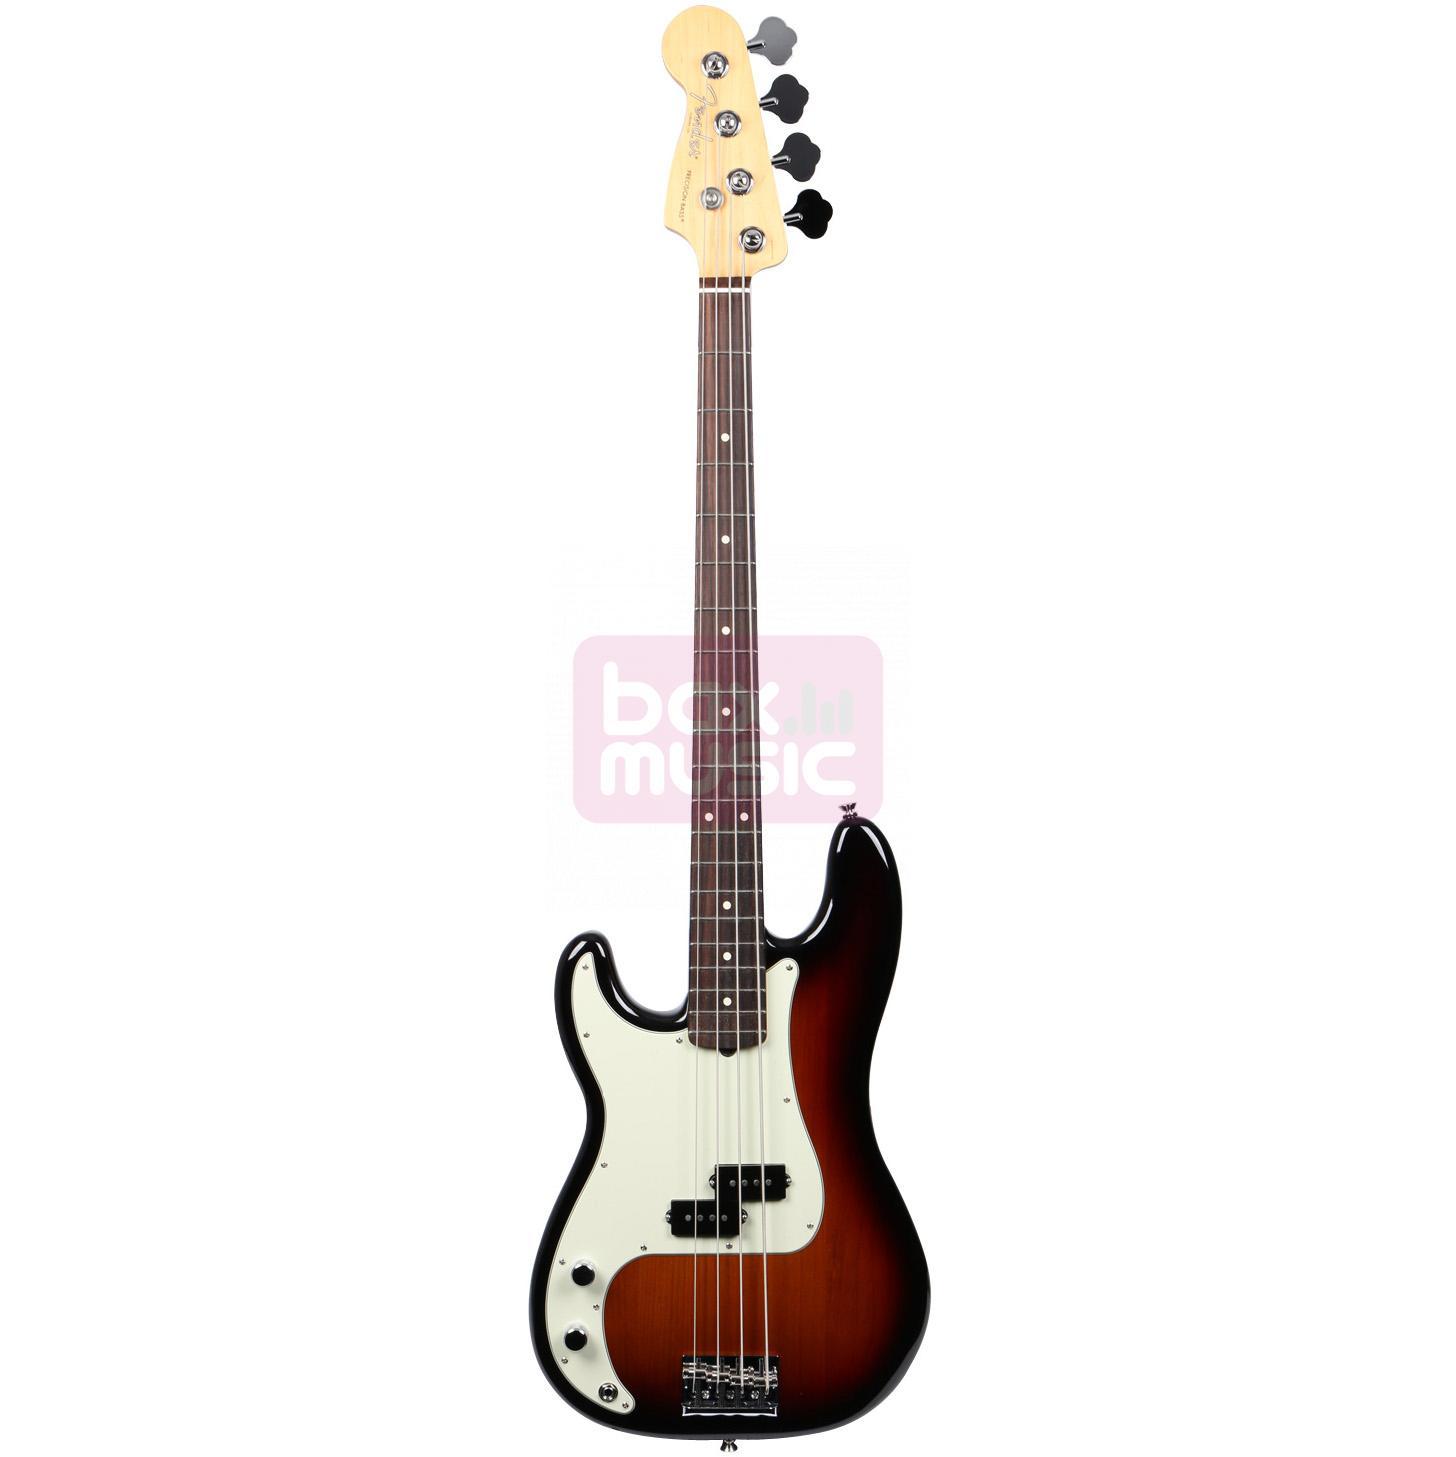 Fender American Professional Precision Bass LH Sunburst RW